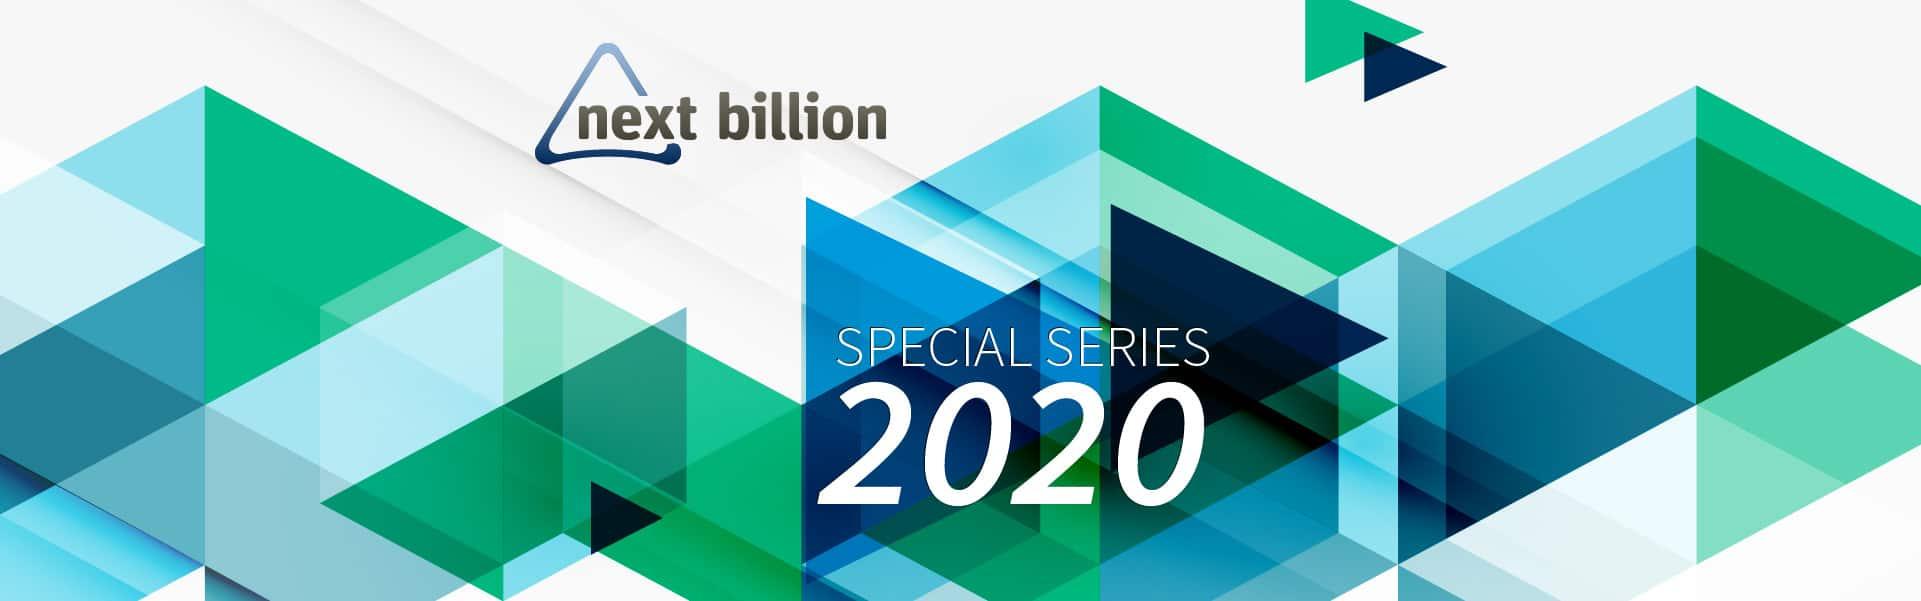 NextBillion's Special Series 2020